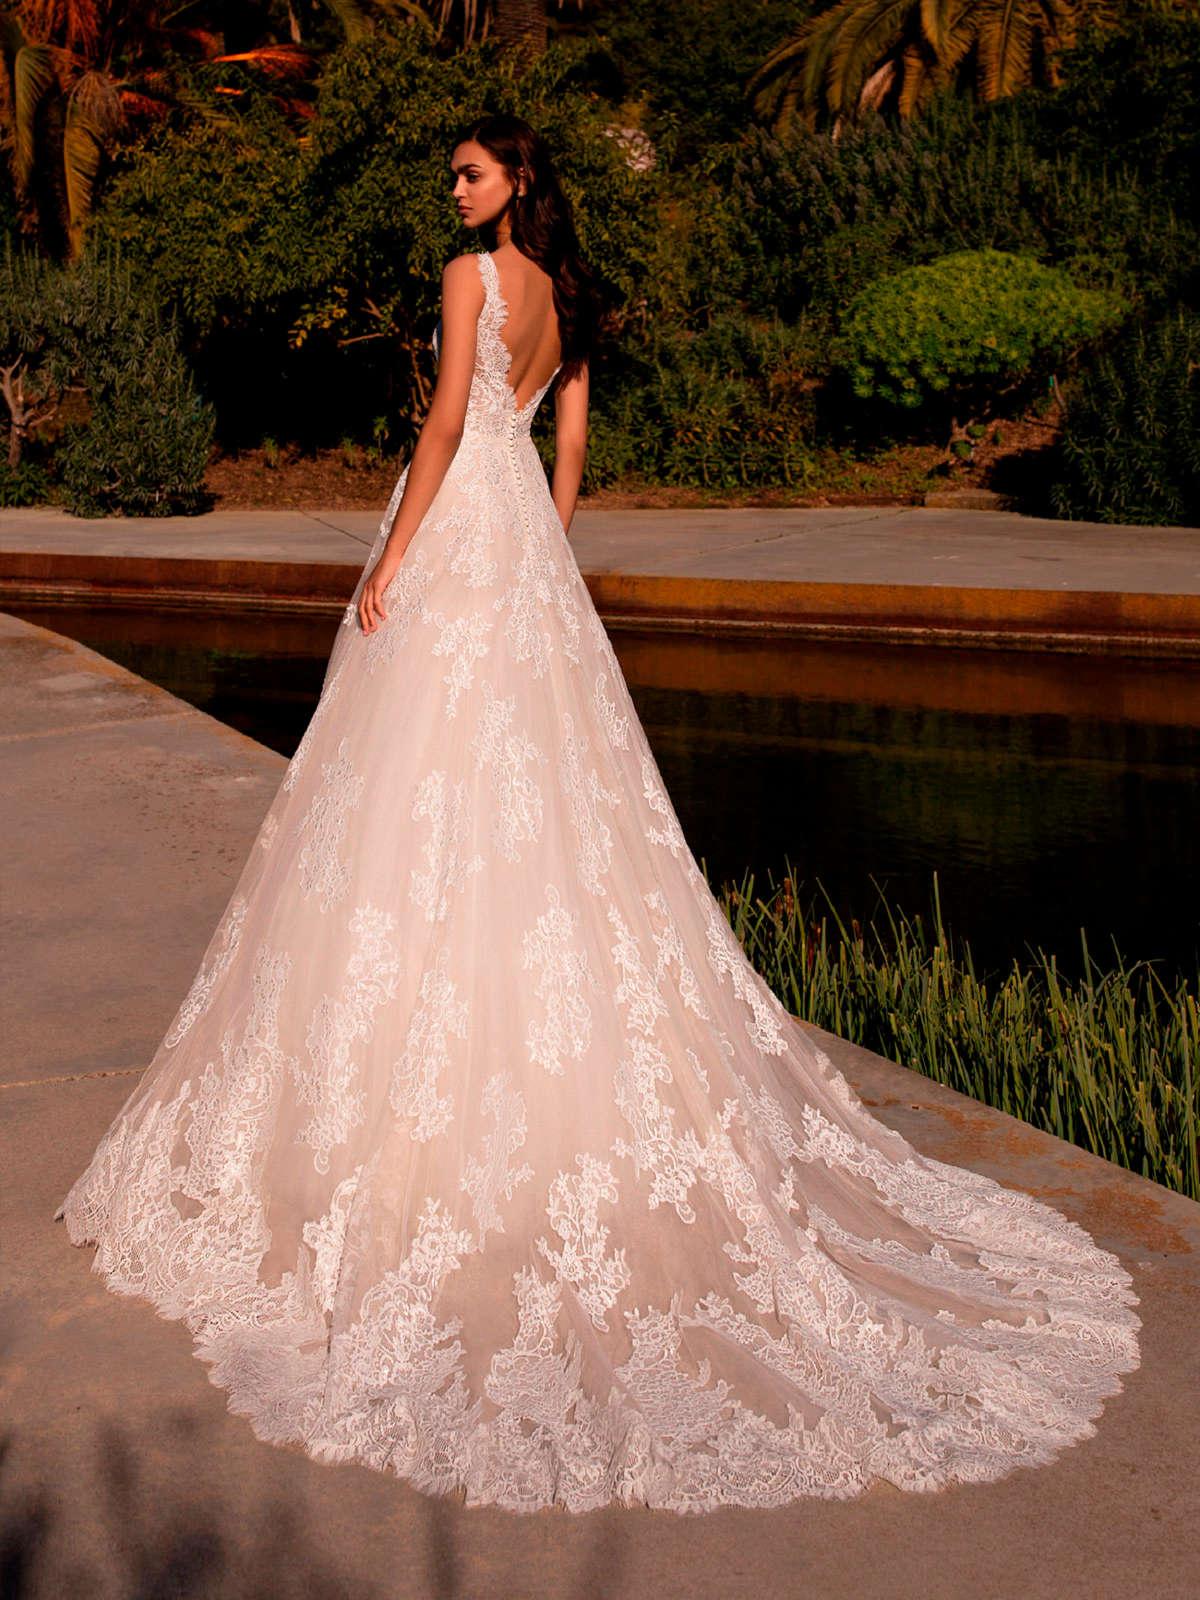 e7a92bbd3 Vestido de novia en Guadalajara - Catálogos